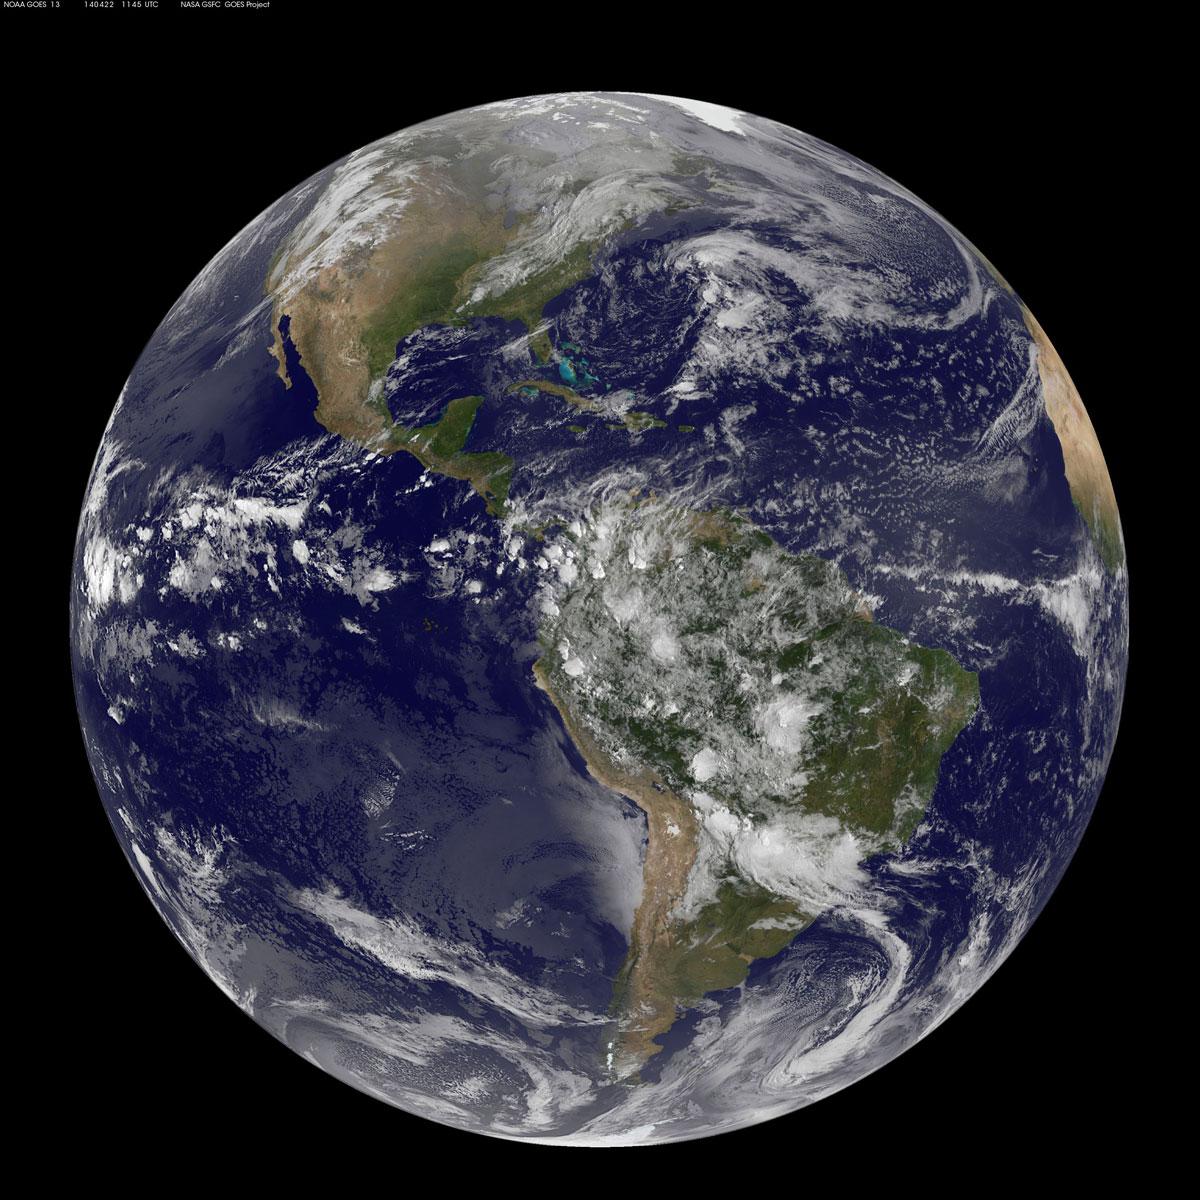 nasa earth day gallery (13)